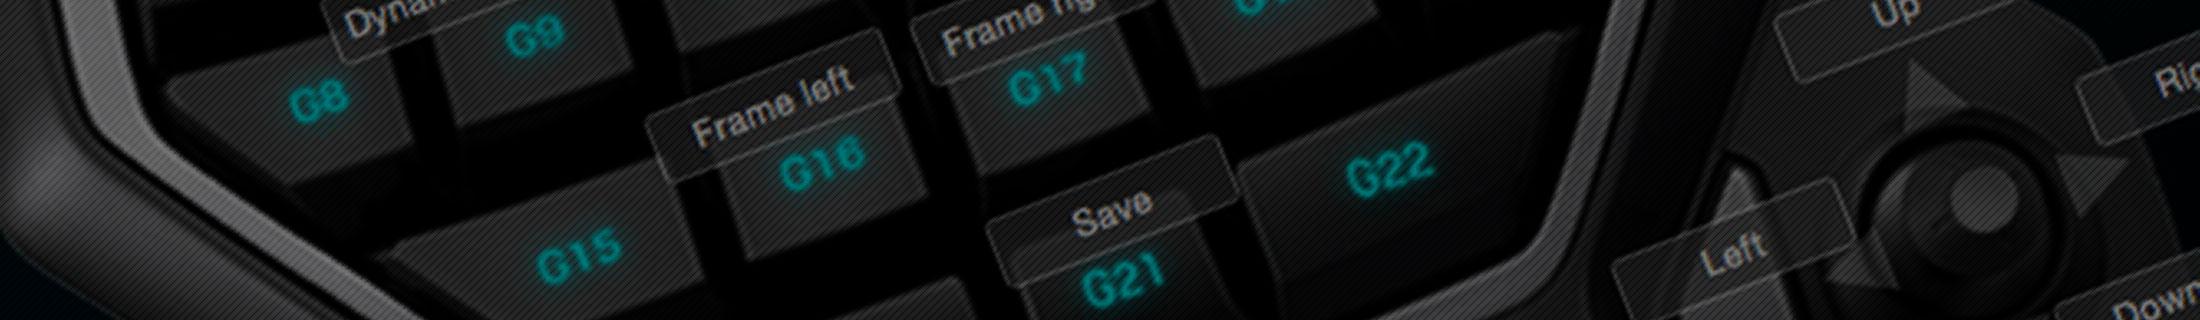 Using Logitech G13 with DaVinci Resolve 12